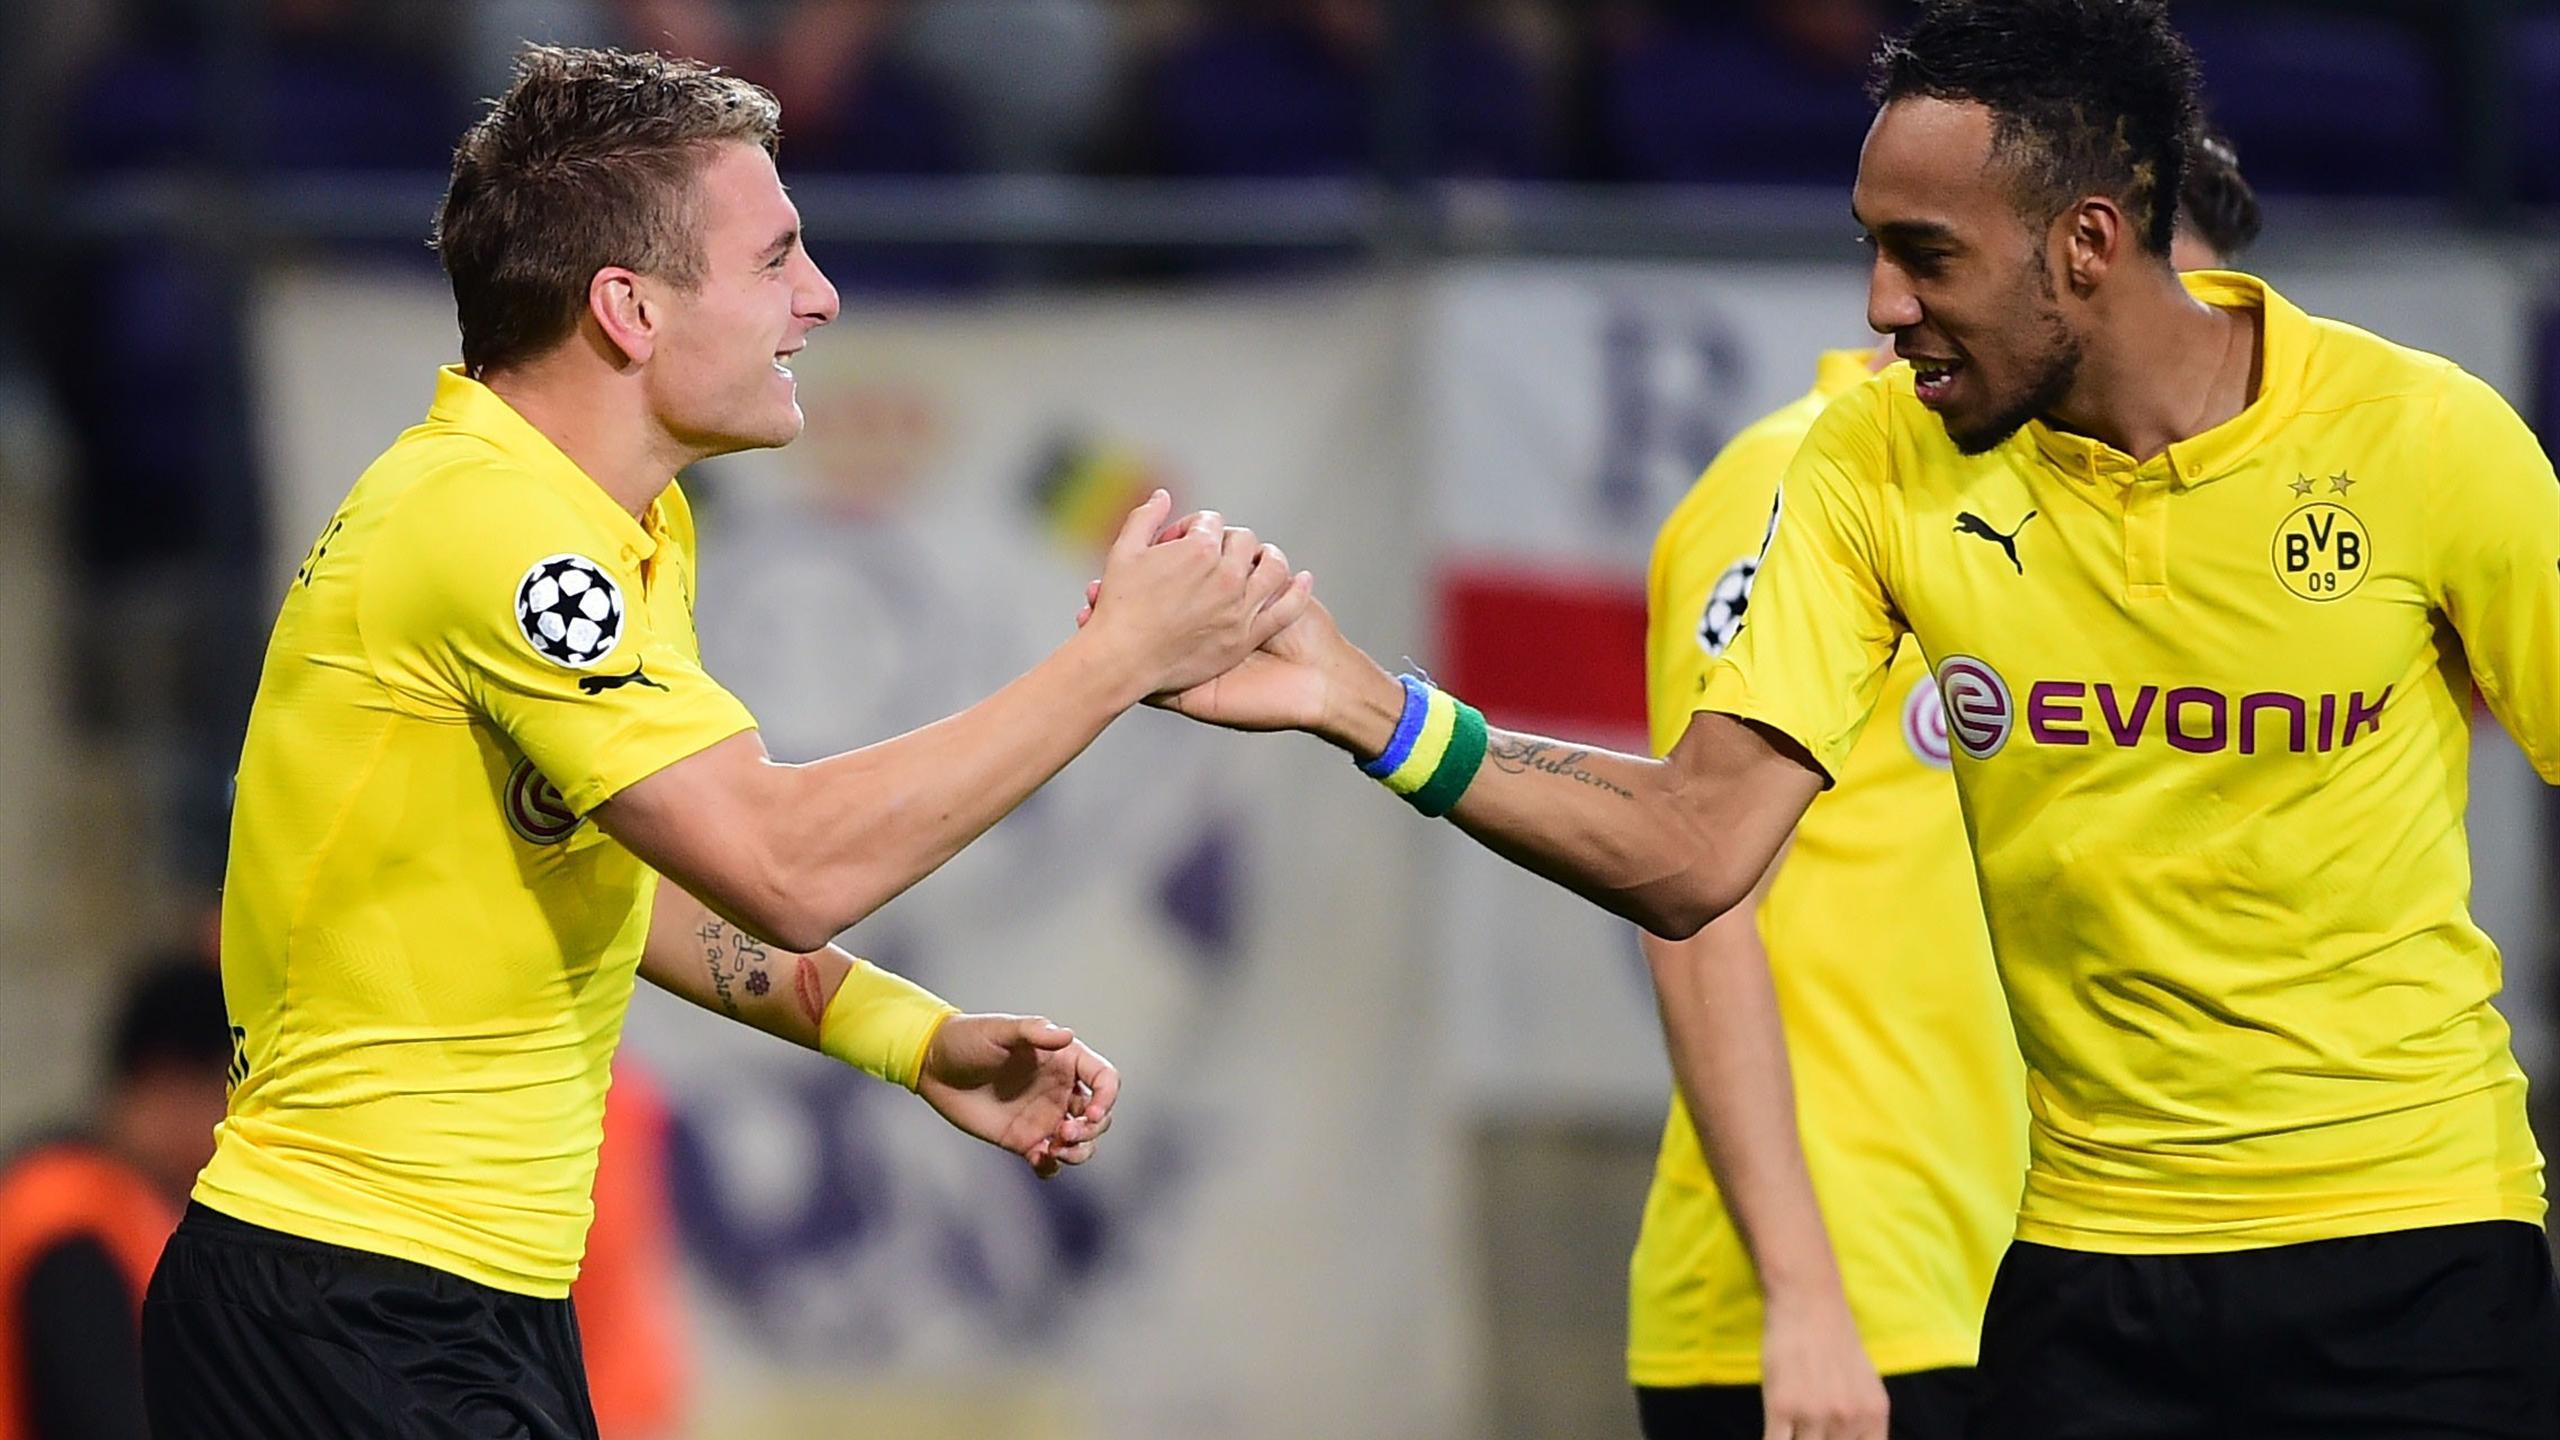 Image Result For Borussia Dortmund En Vivo Stream Vs Vivo Borussia Dortmund